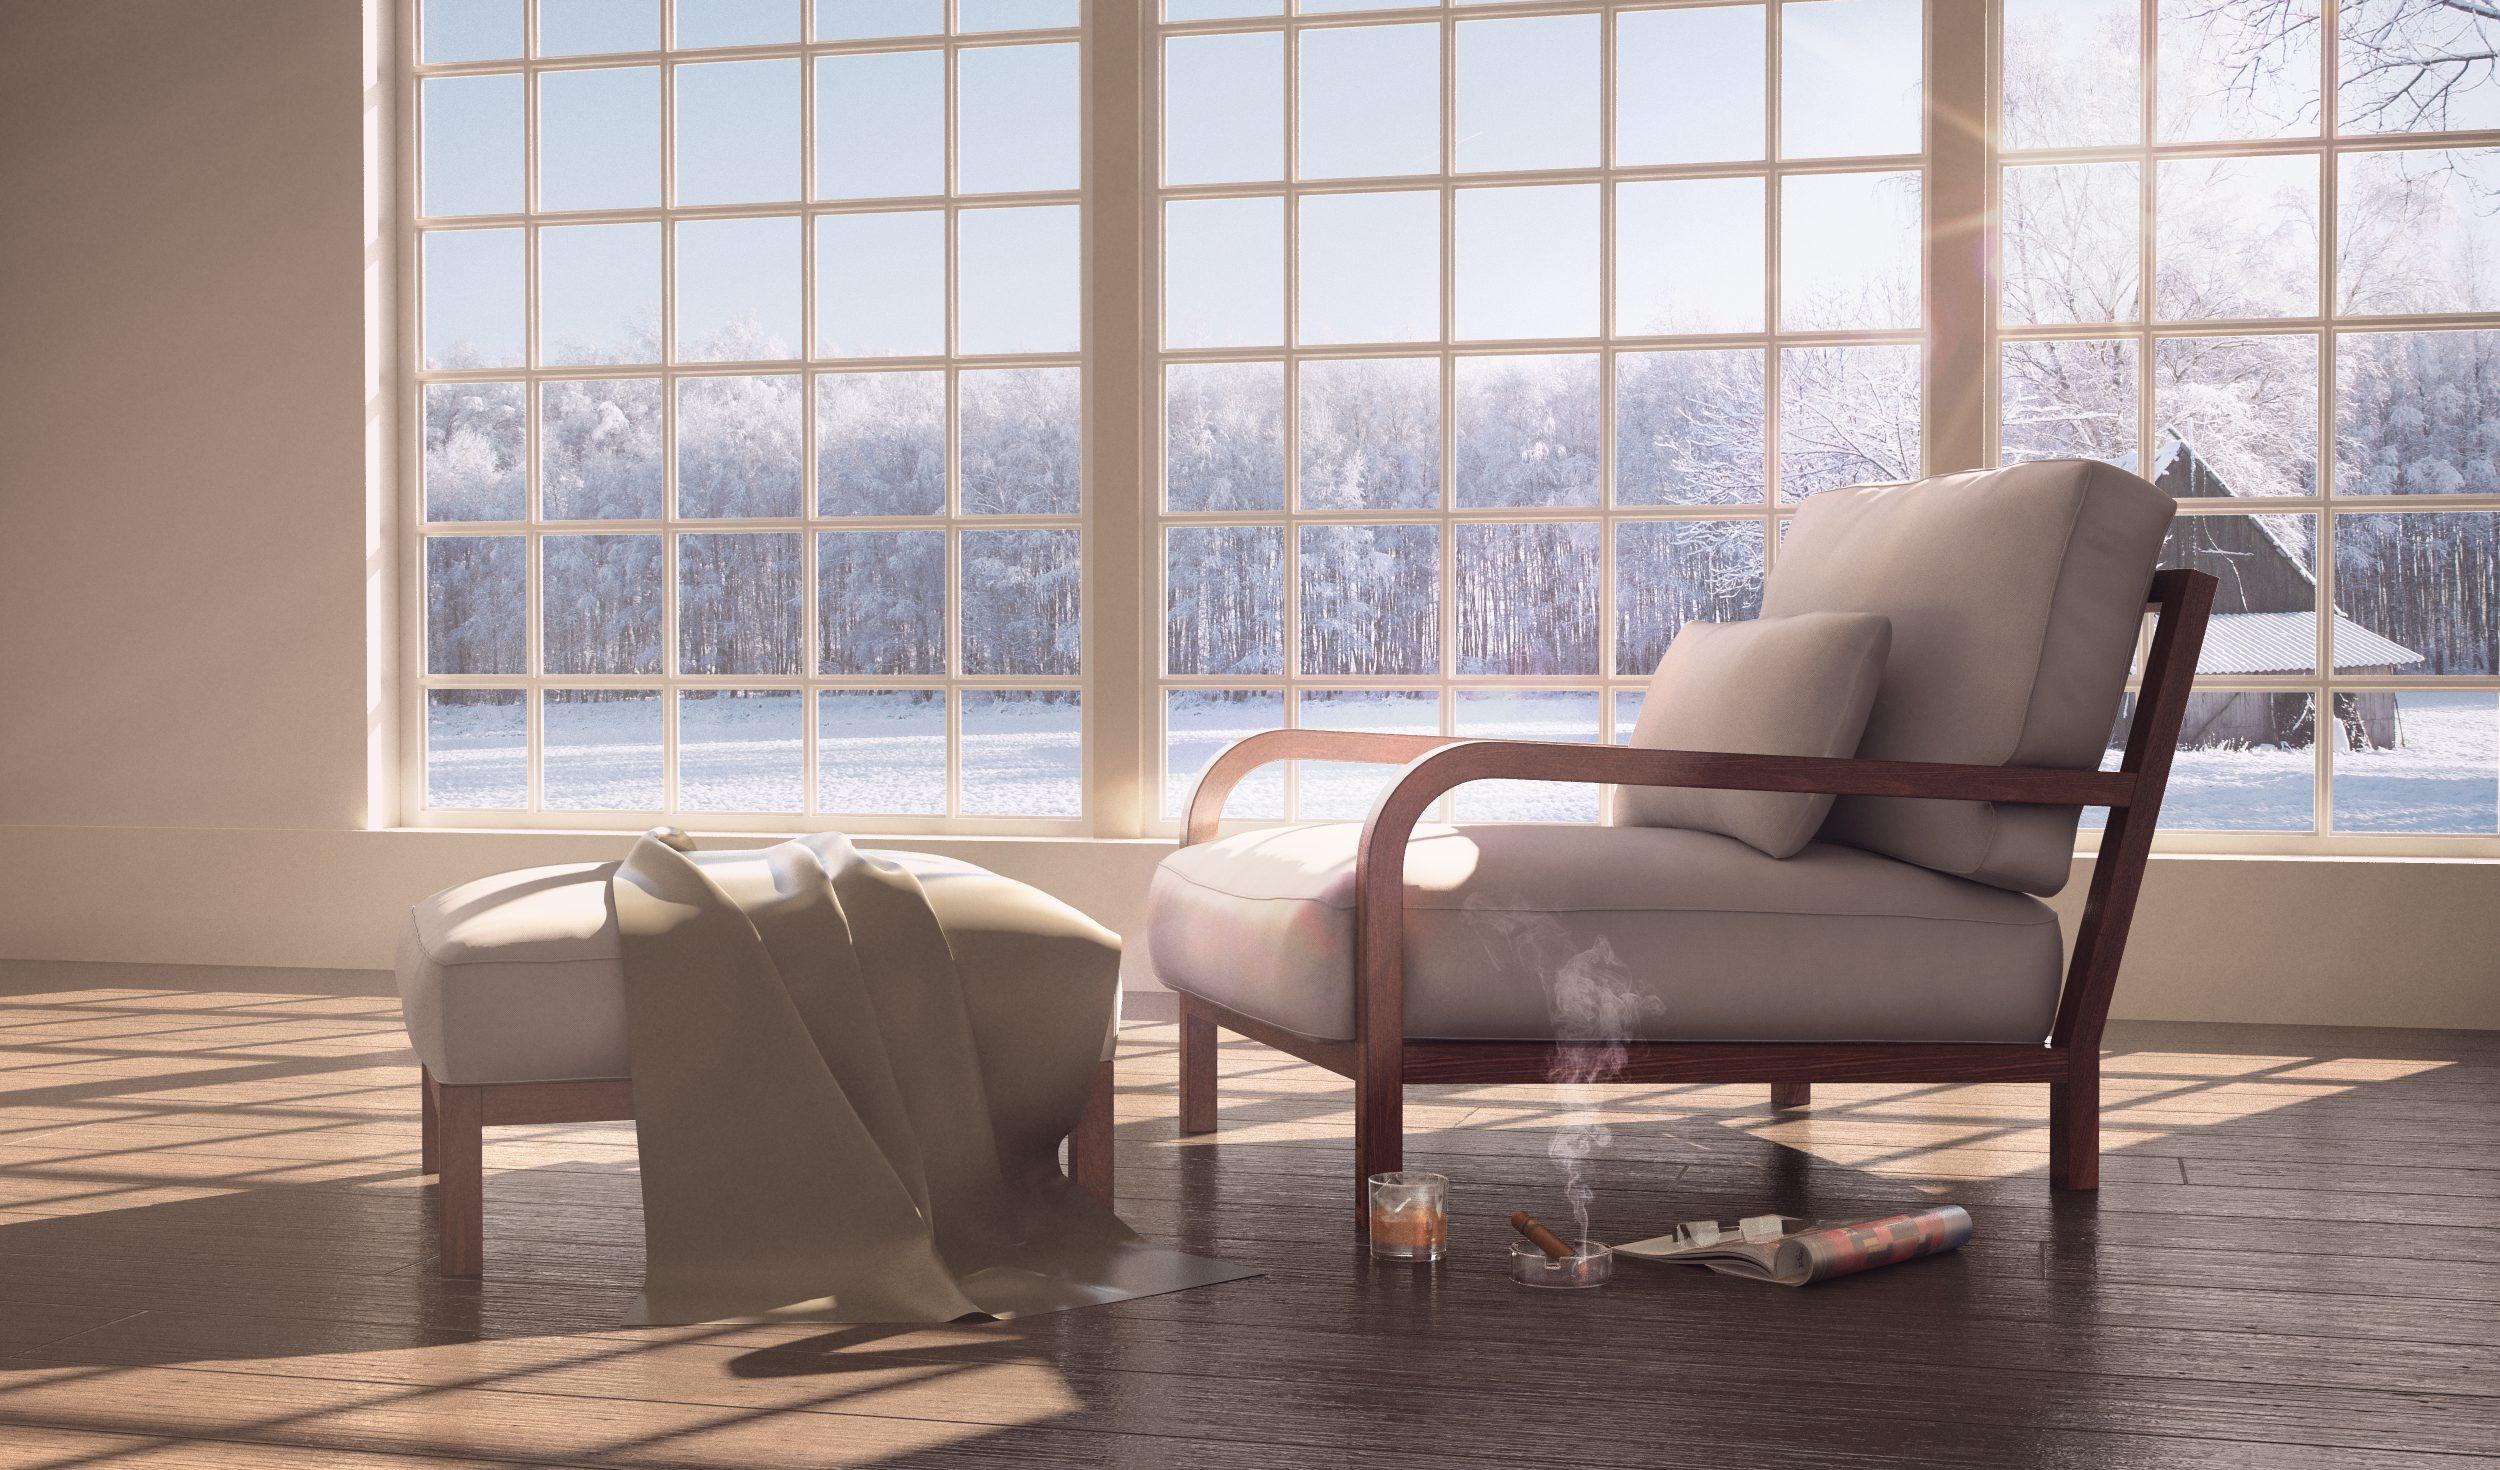 Interior_Focus_shot_chair_in_winter